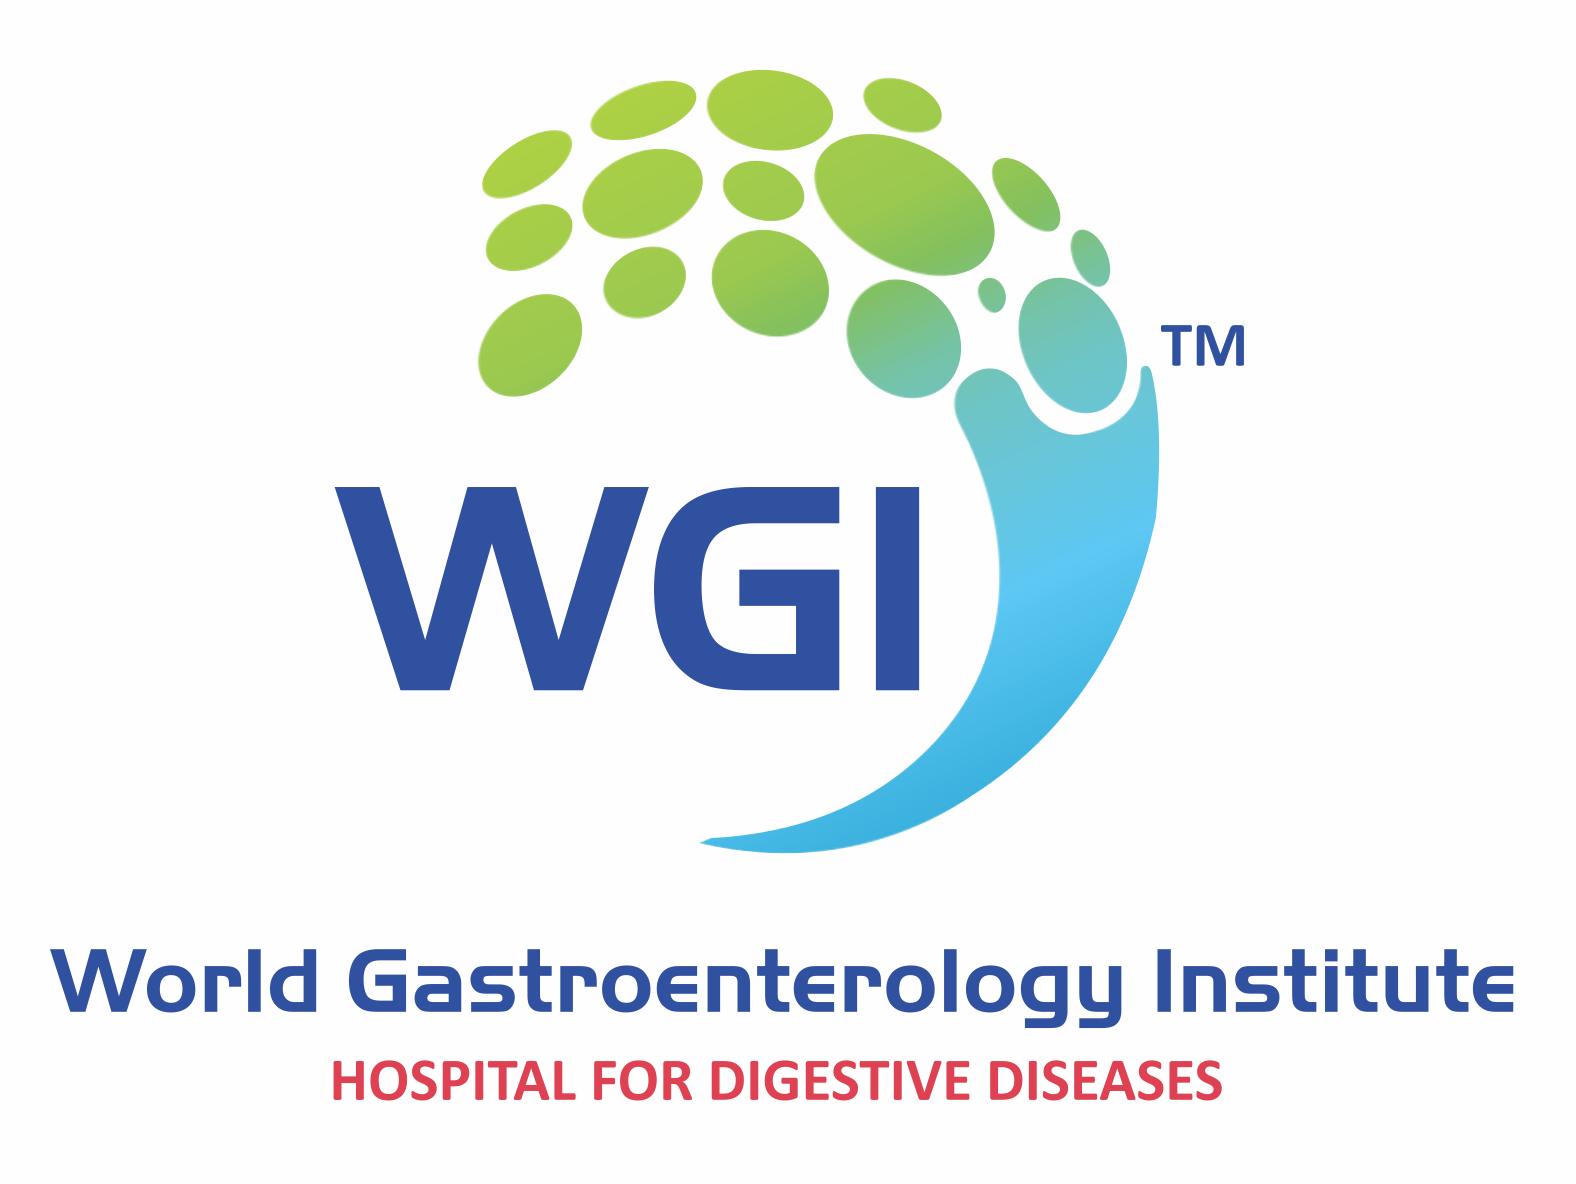 WGI_logo - JPG